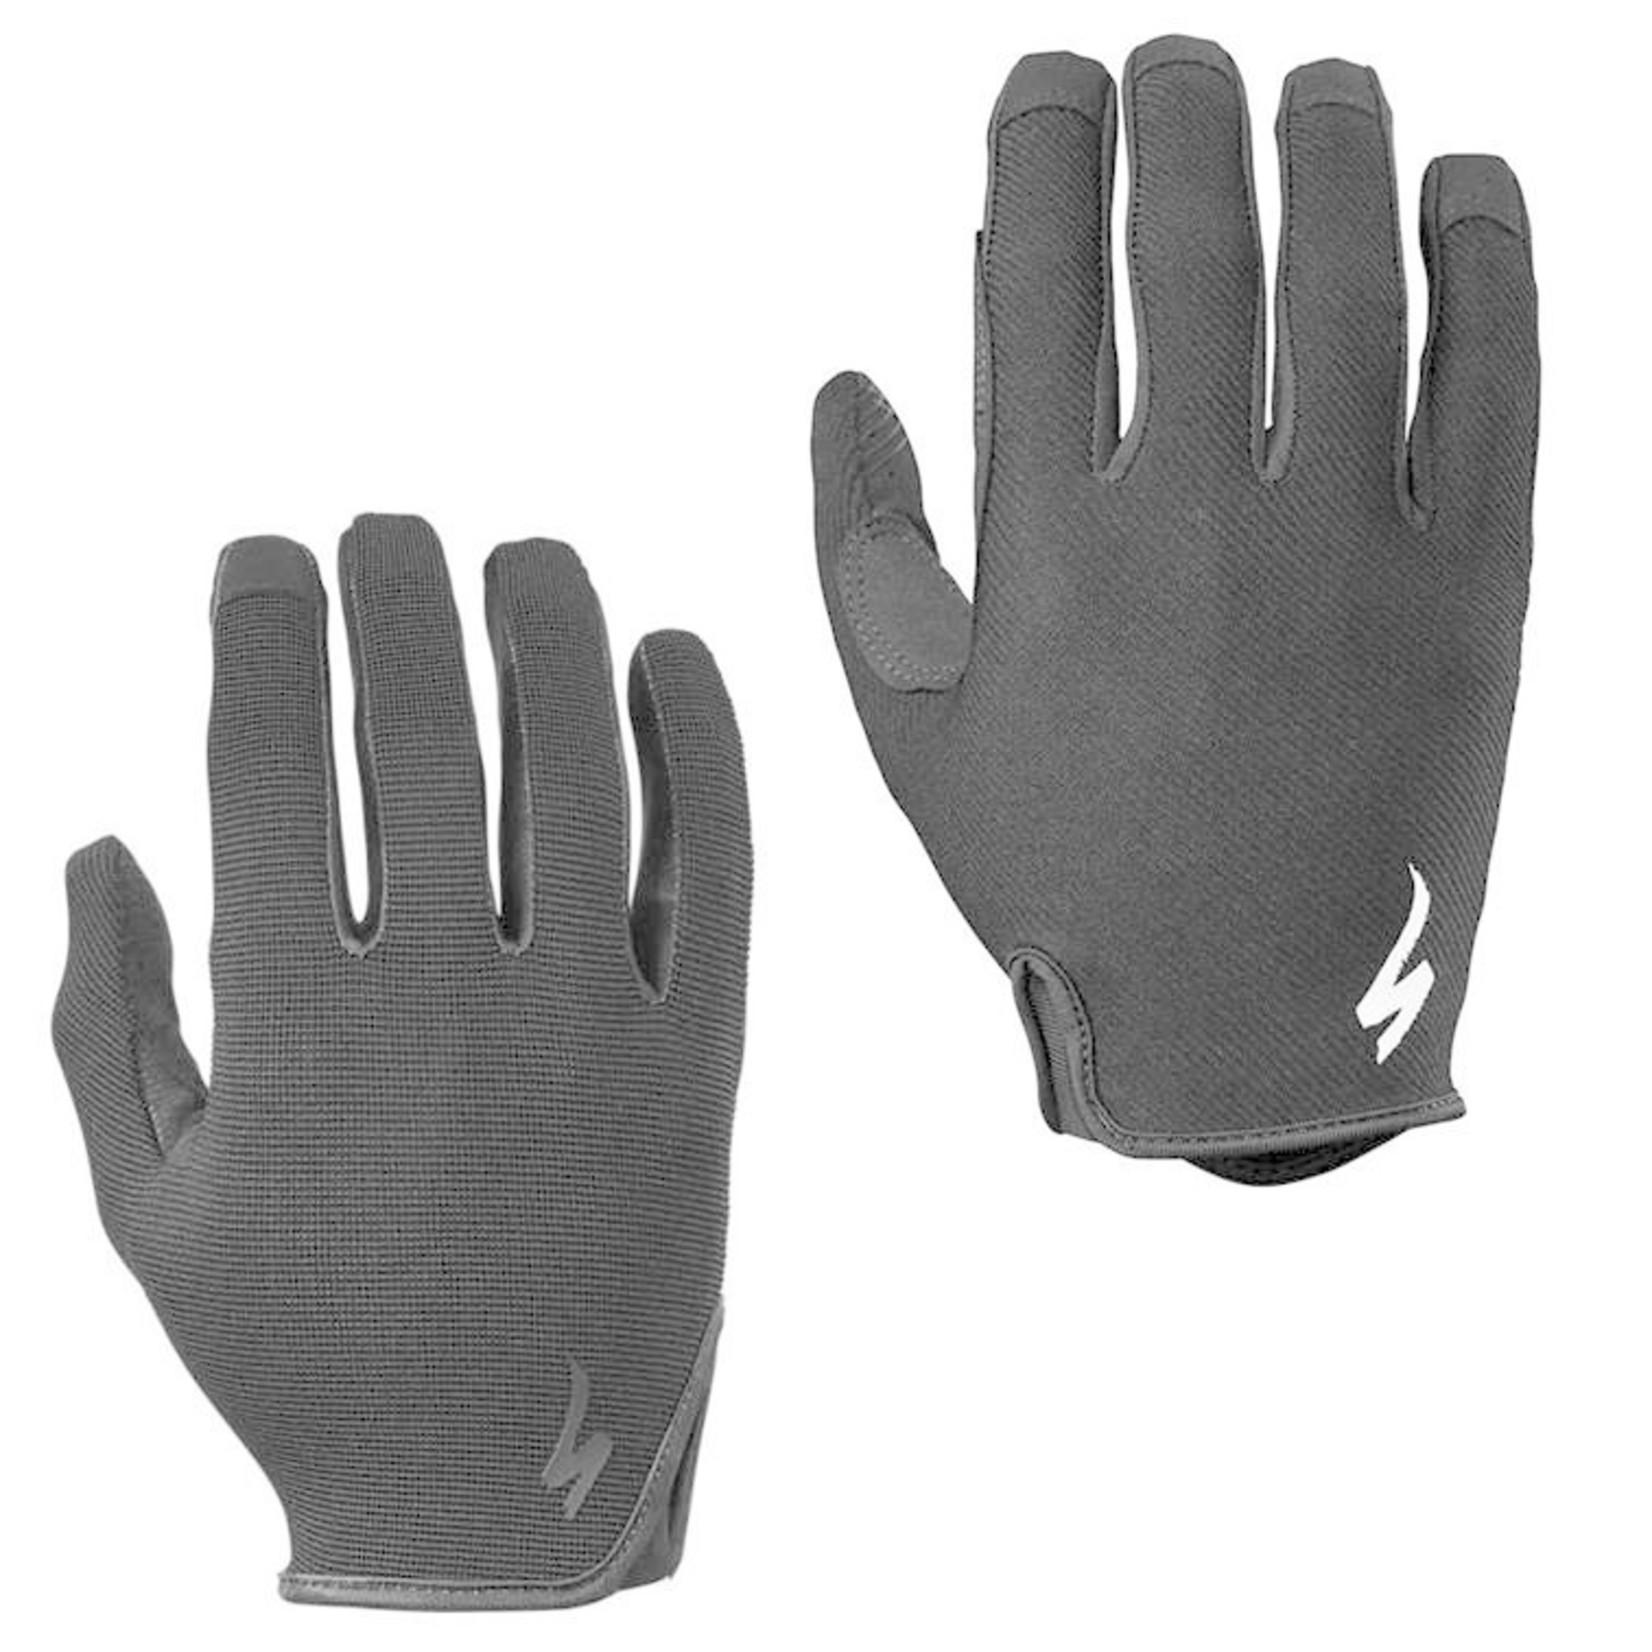 SPECIALIZED Specialized Lowdown Long Finger Glove Black